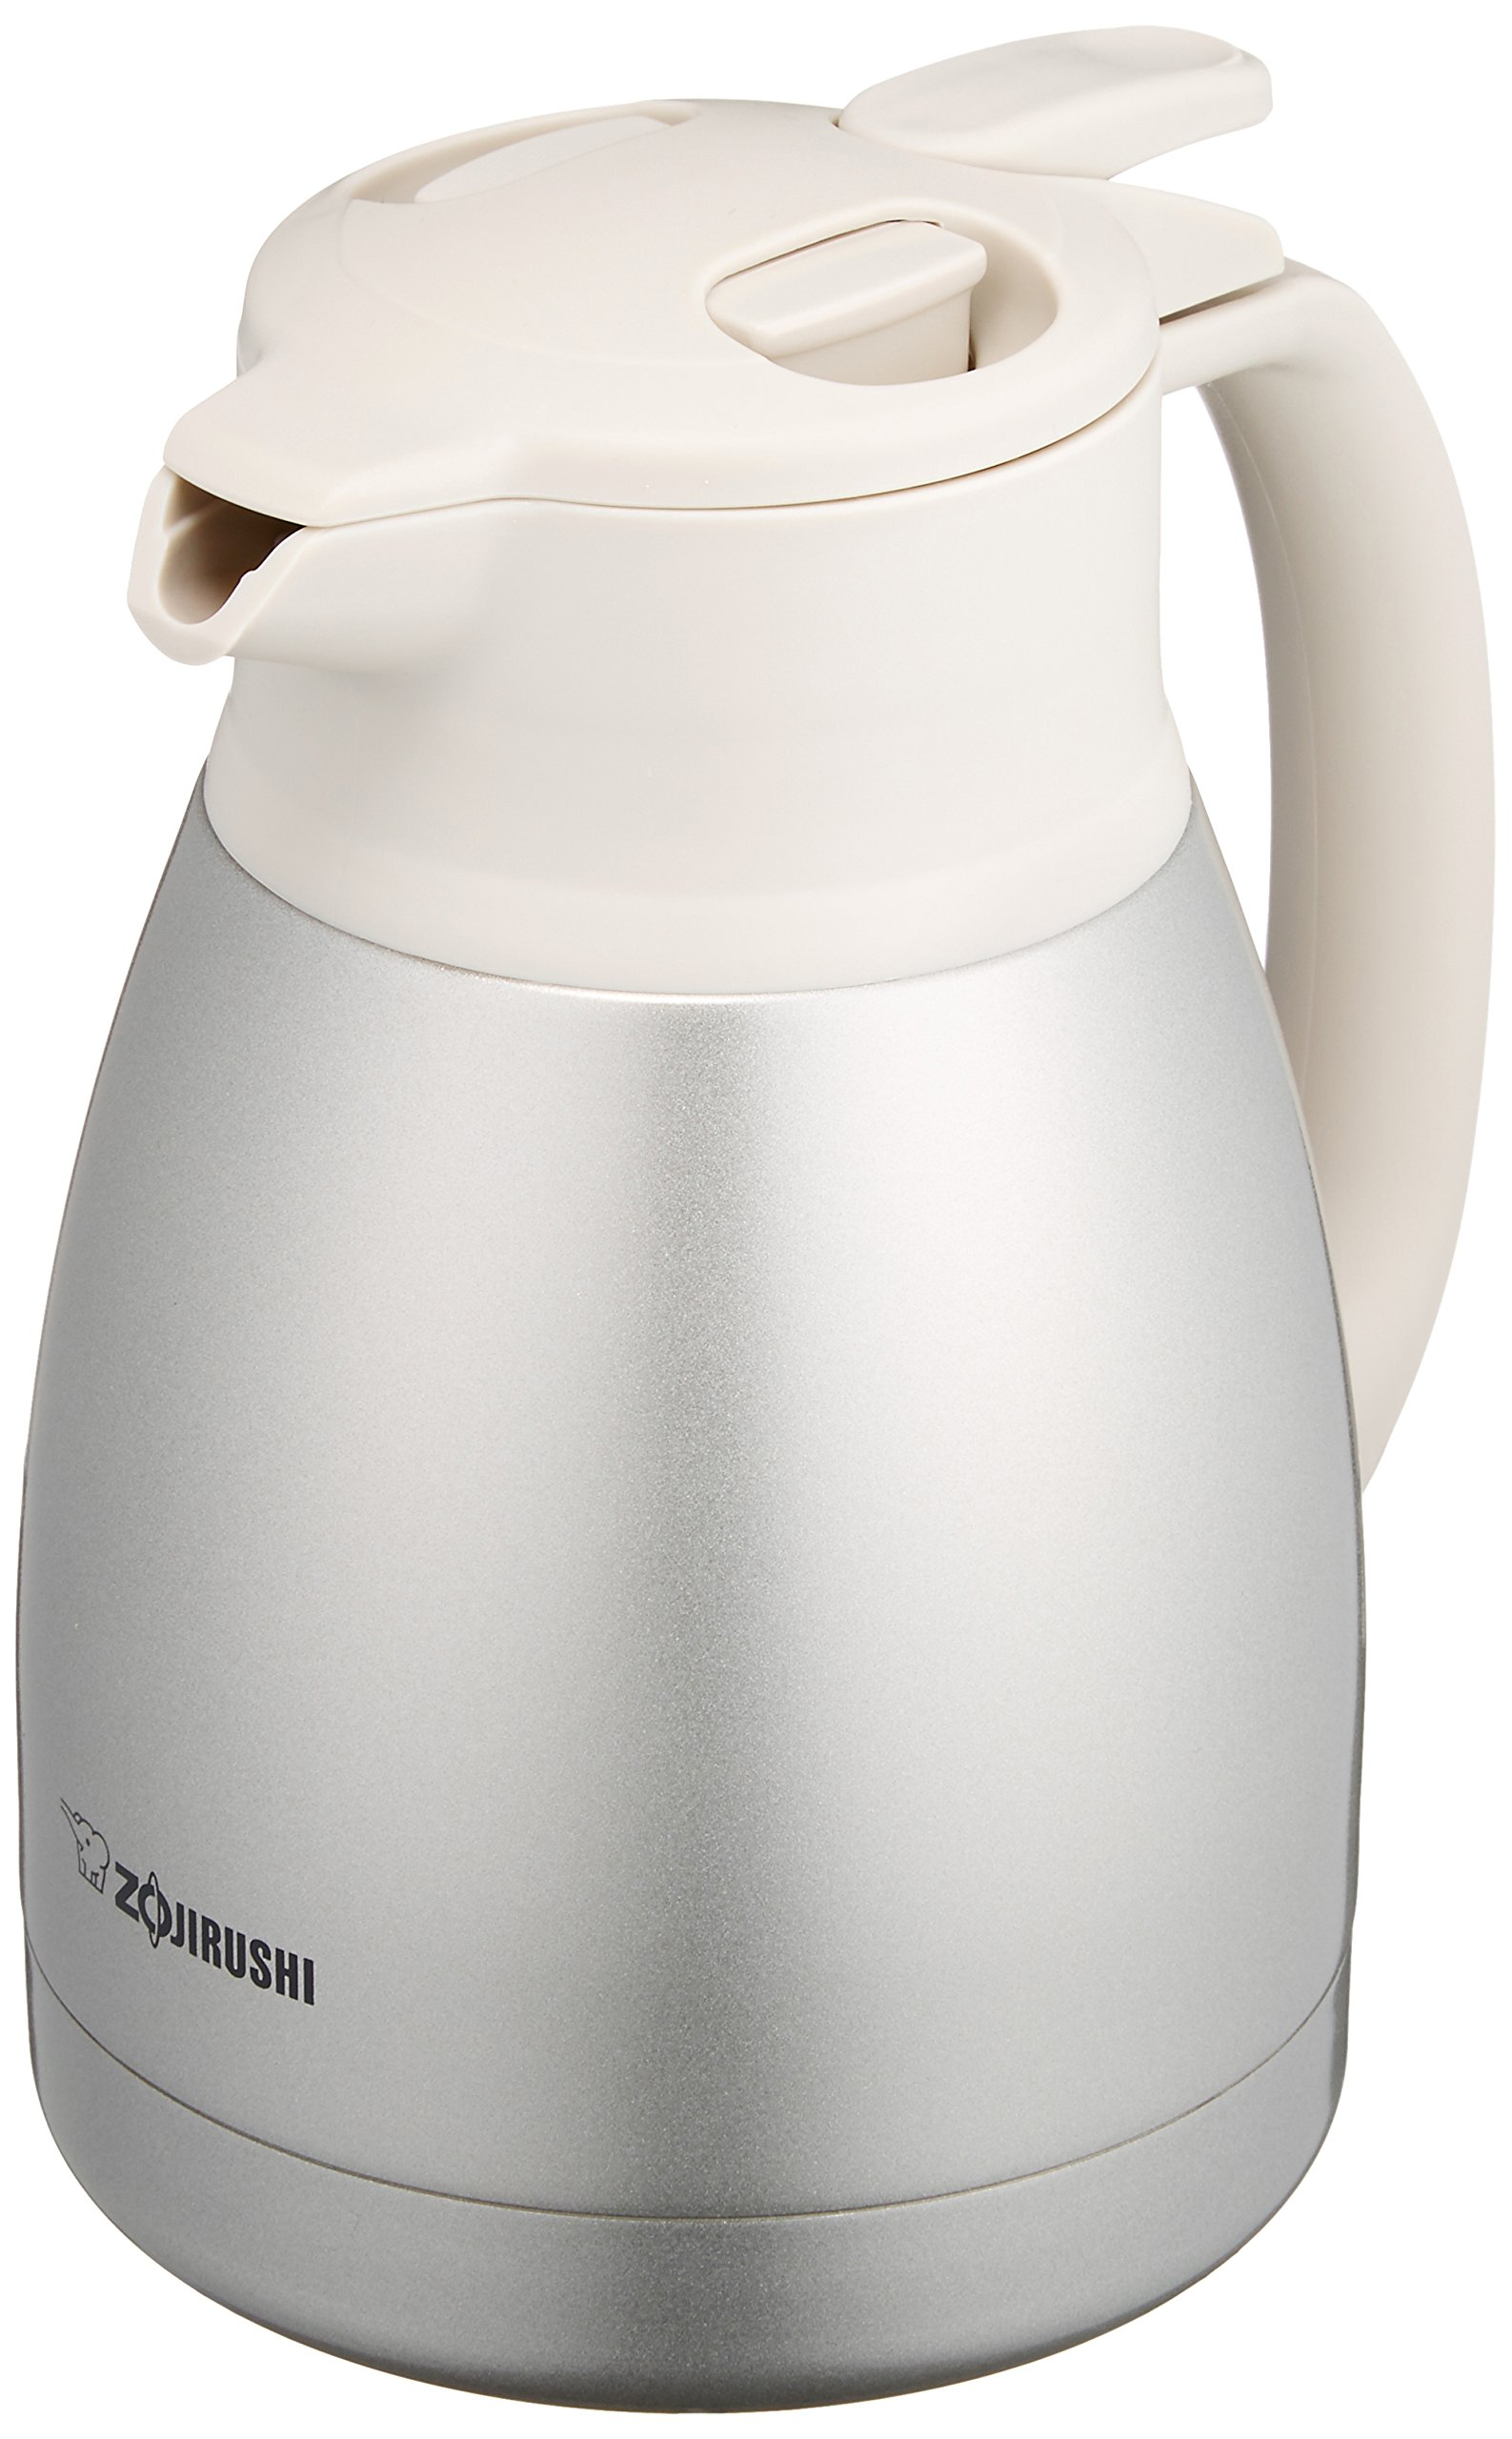 Zojirushi stainless steel pot 1.0L Silver SH-HB10-SA